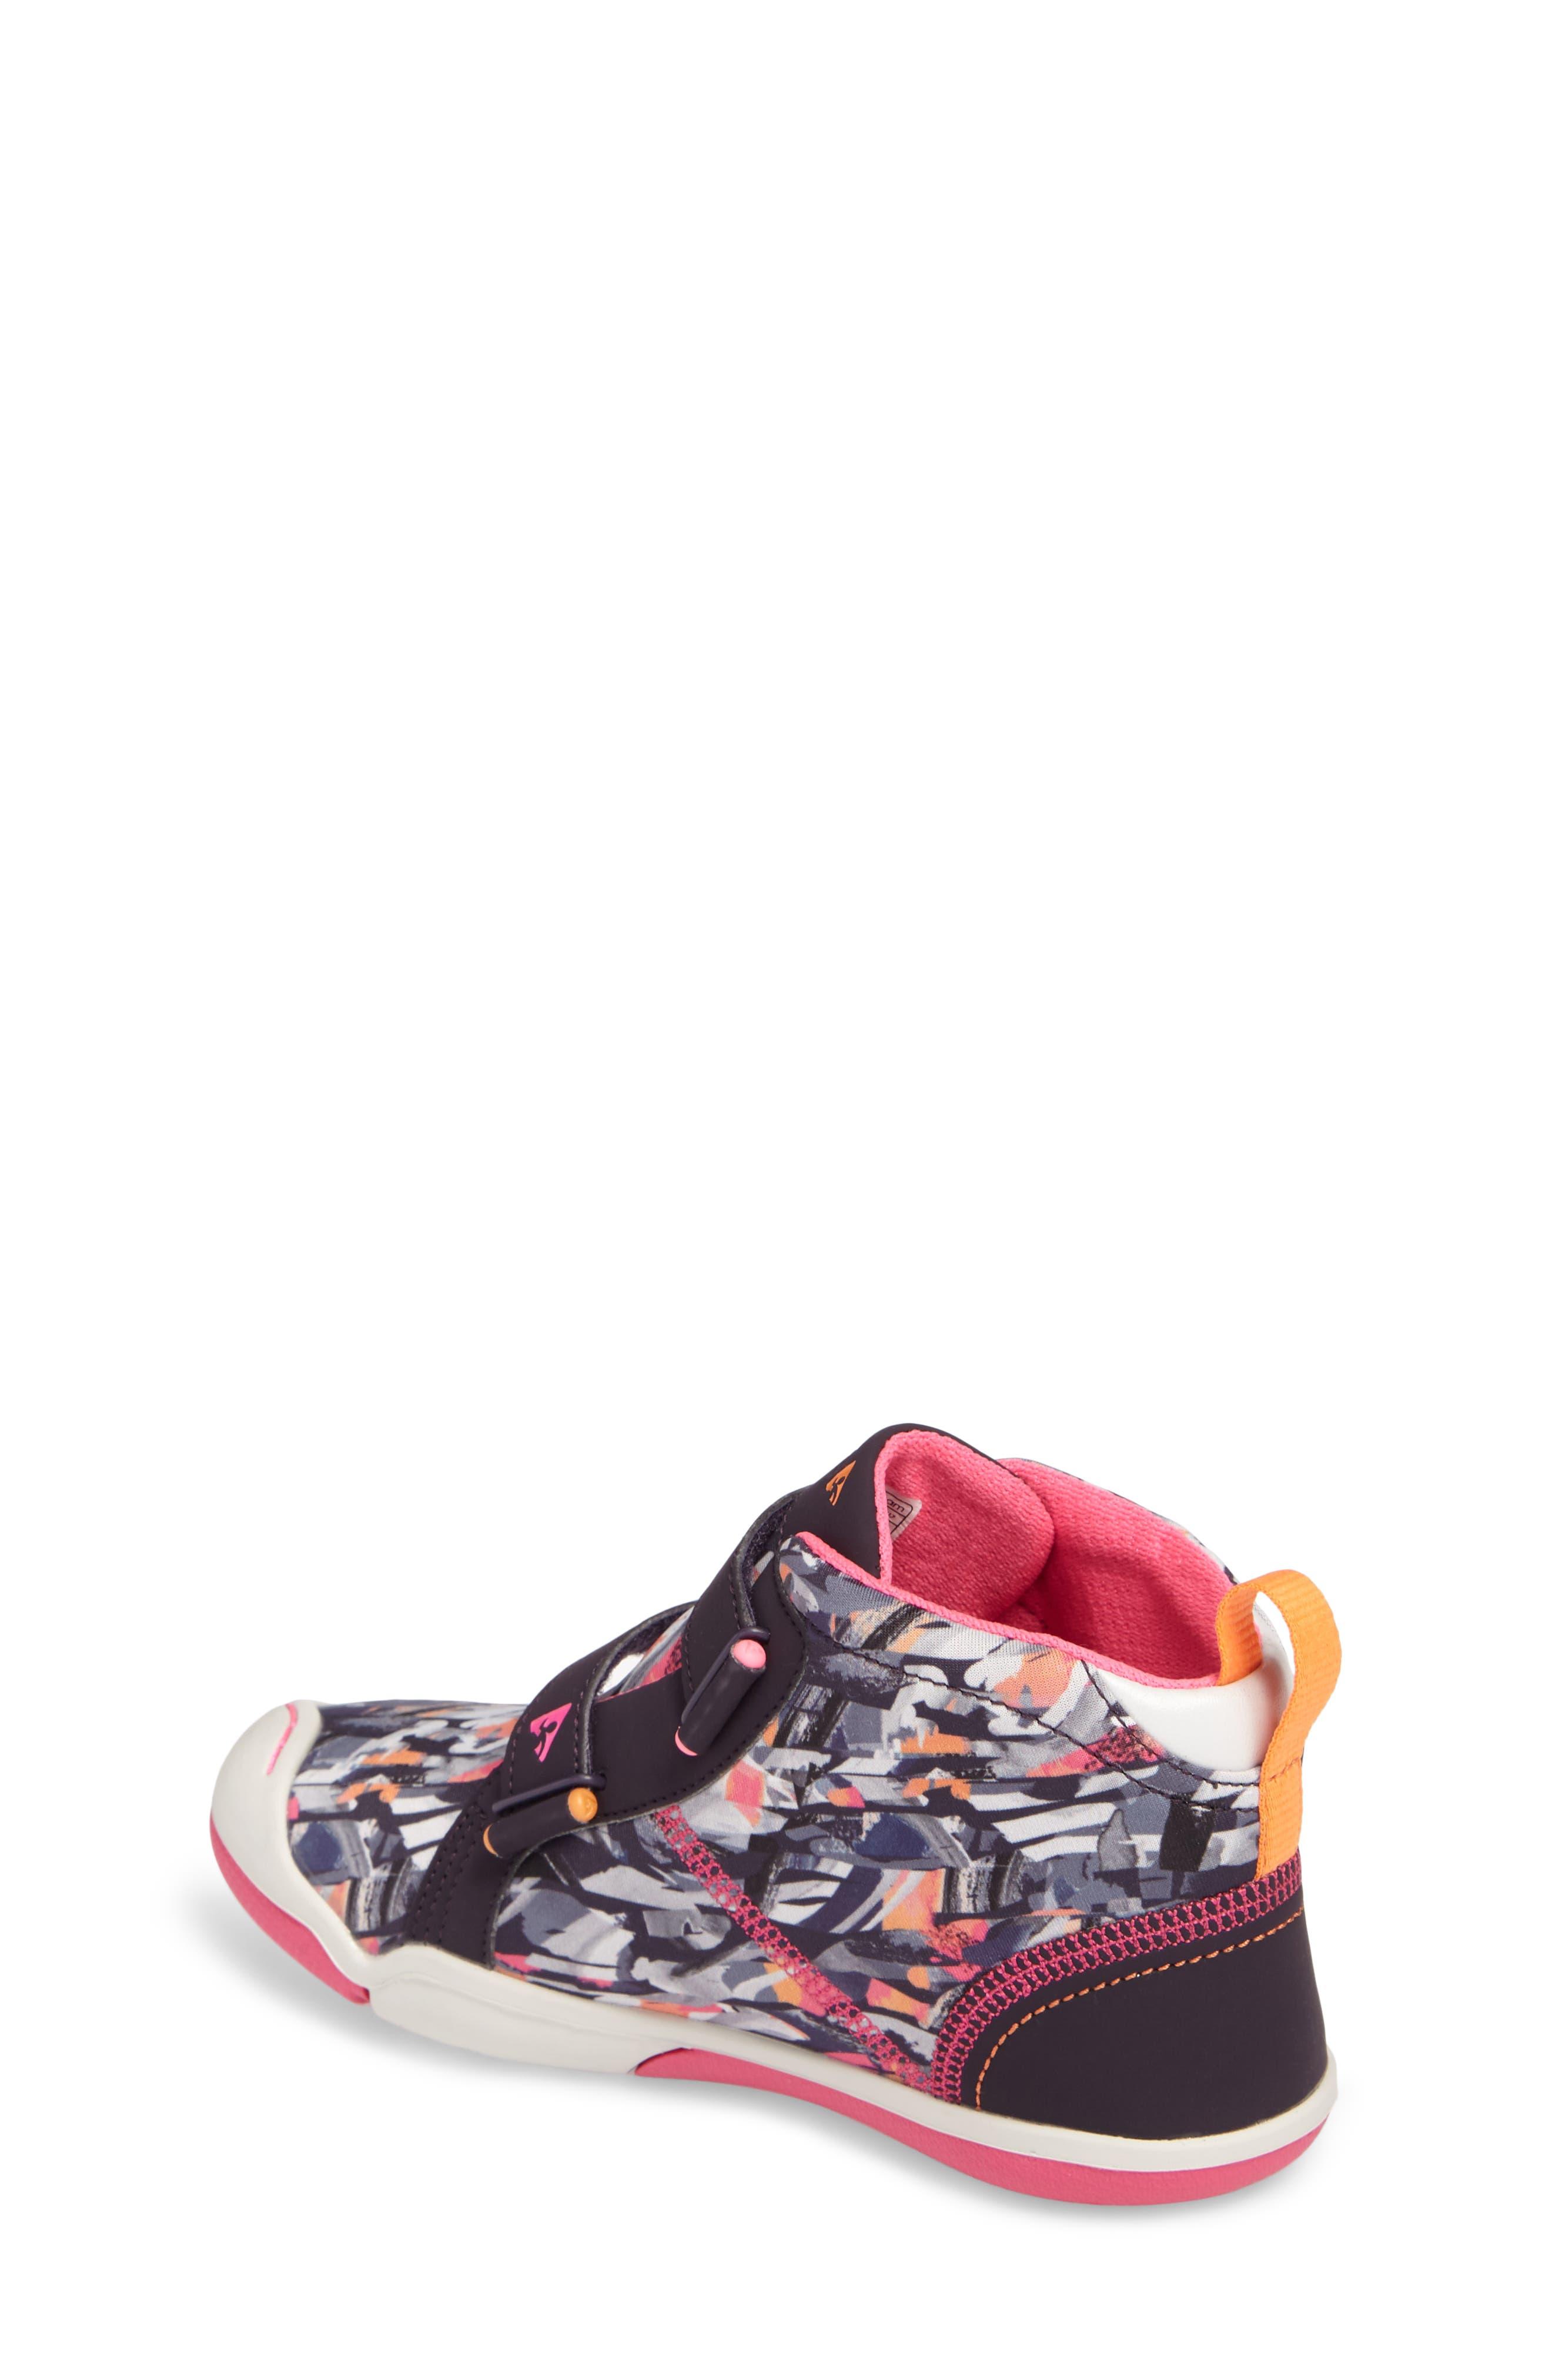 Max Customizable Mid Top Sneaker,                             Alternate thumbnail 2, color,                             503